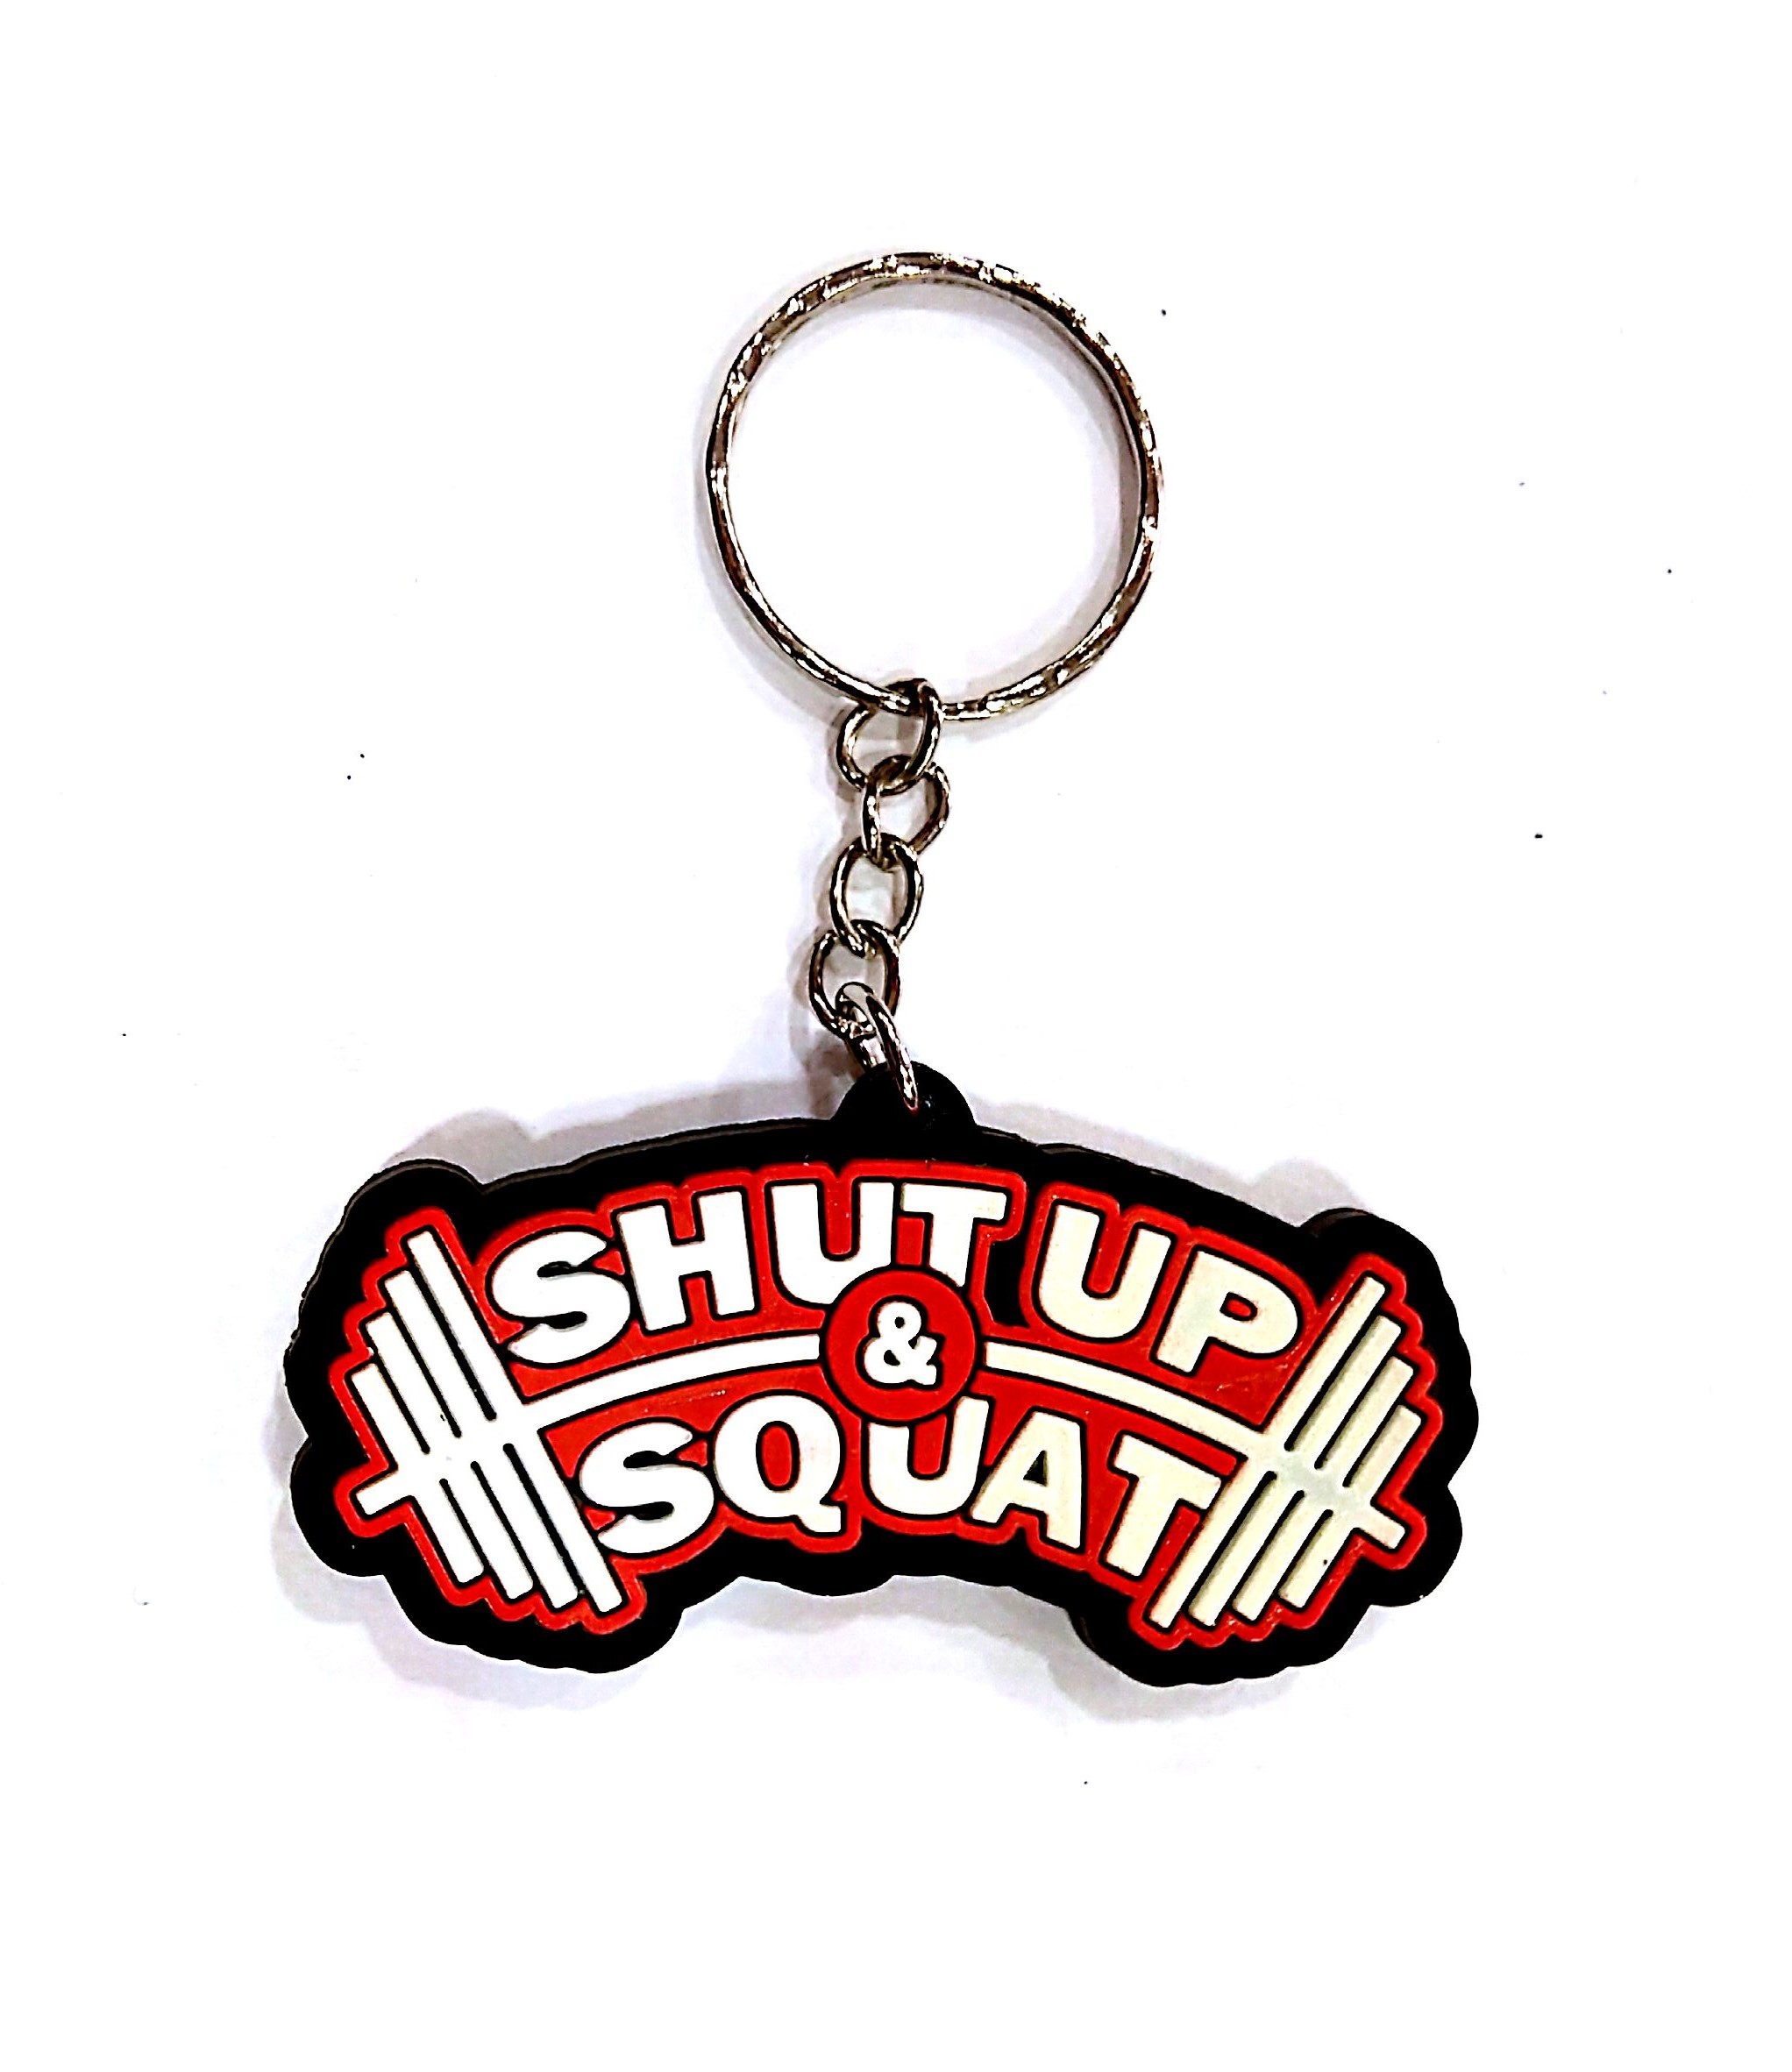 Do4a accs брелок shut up squat